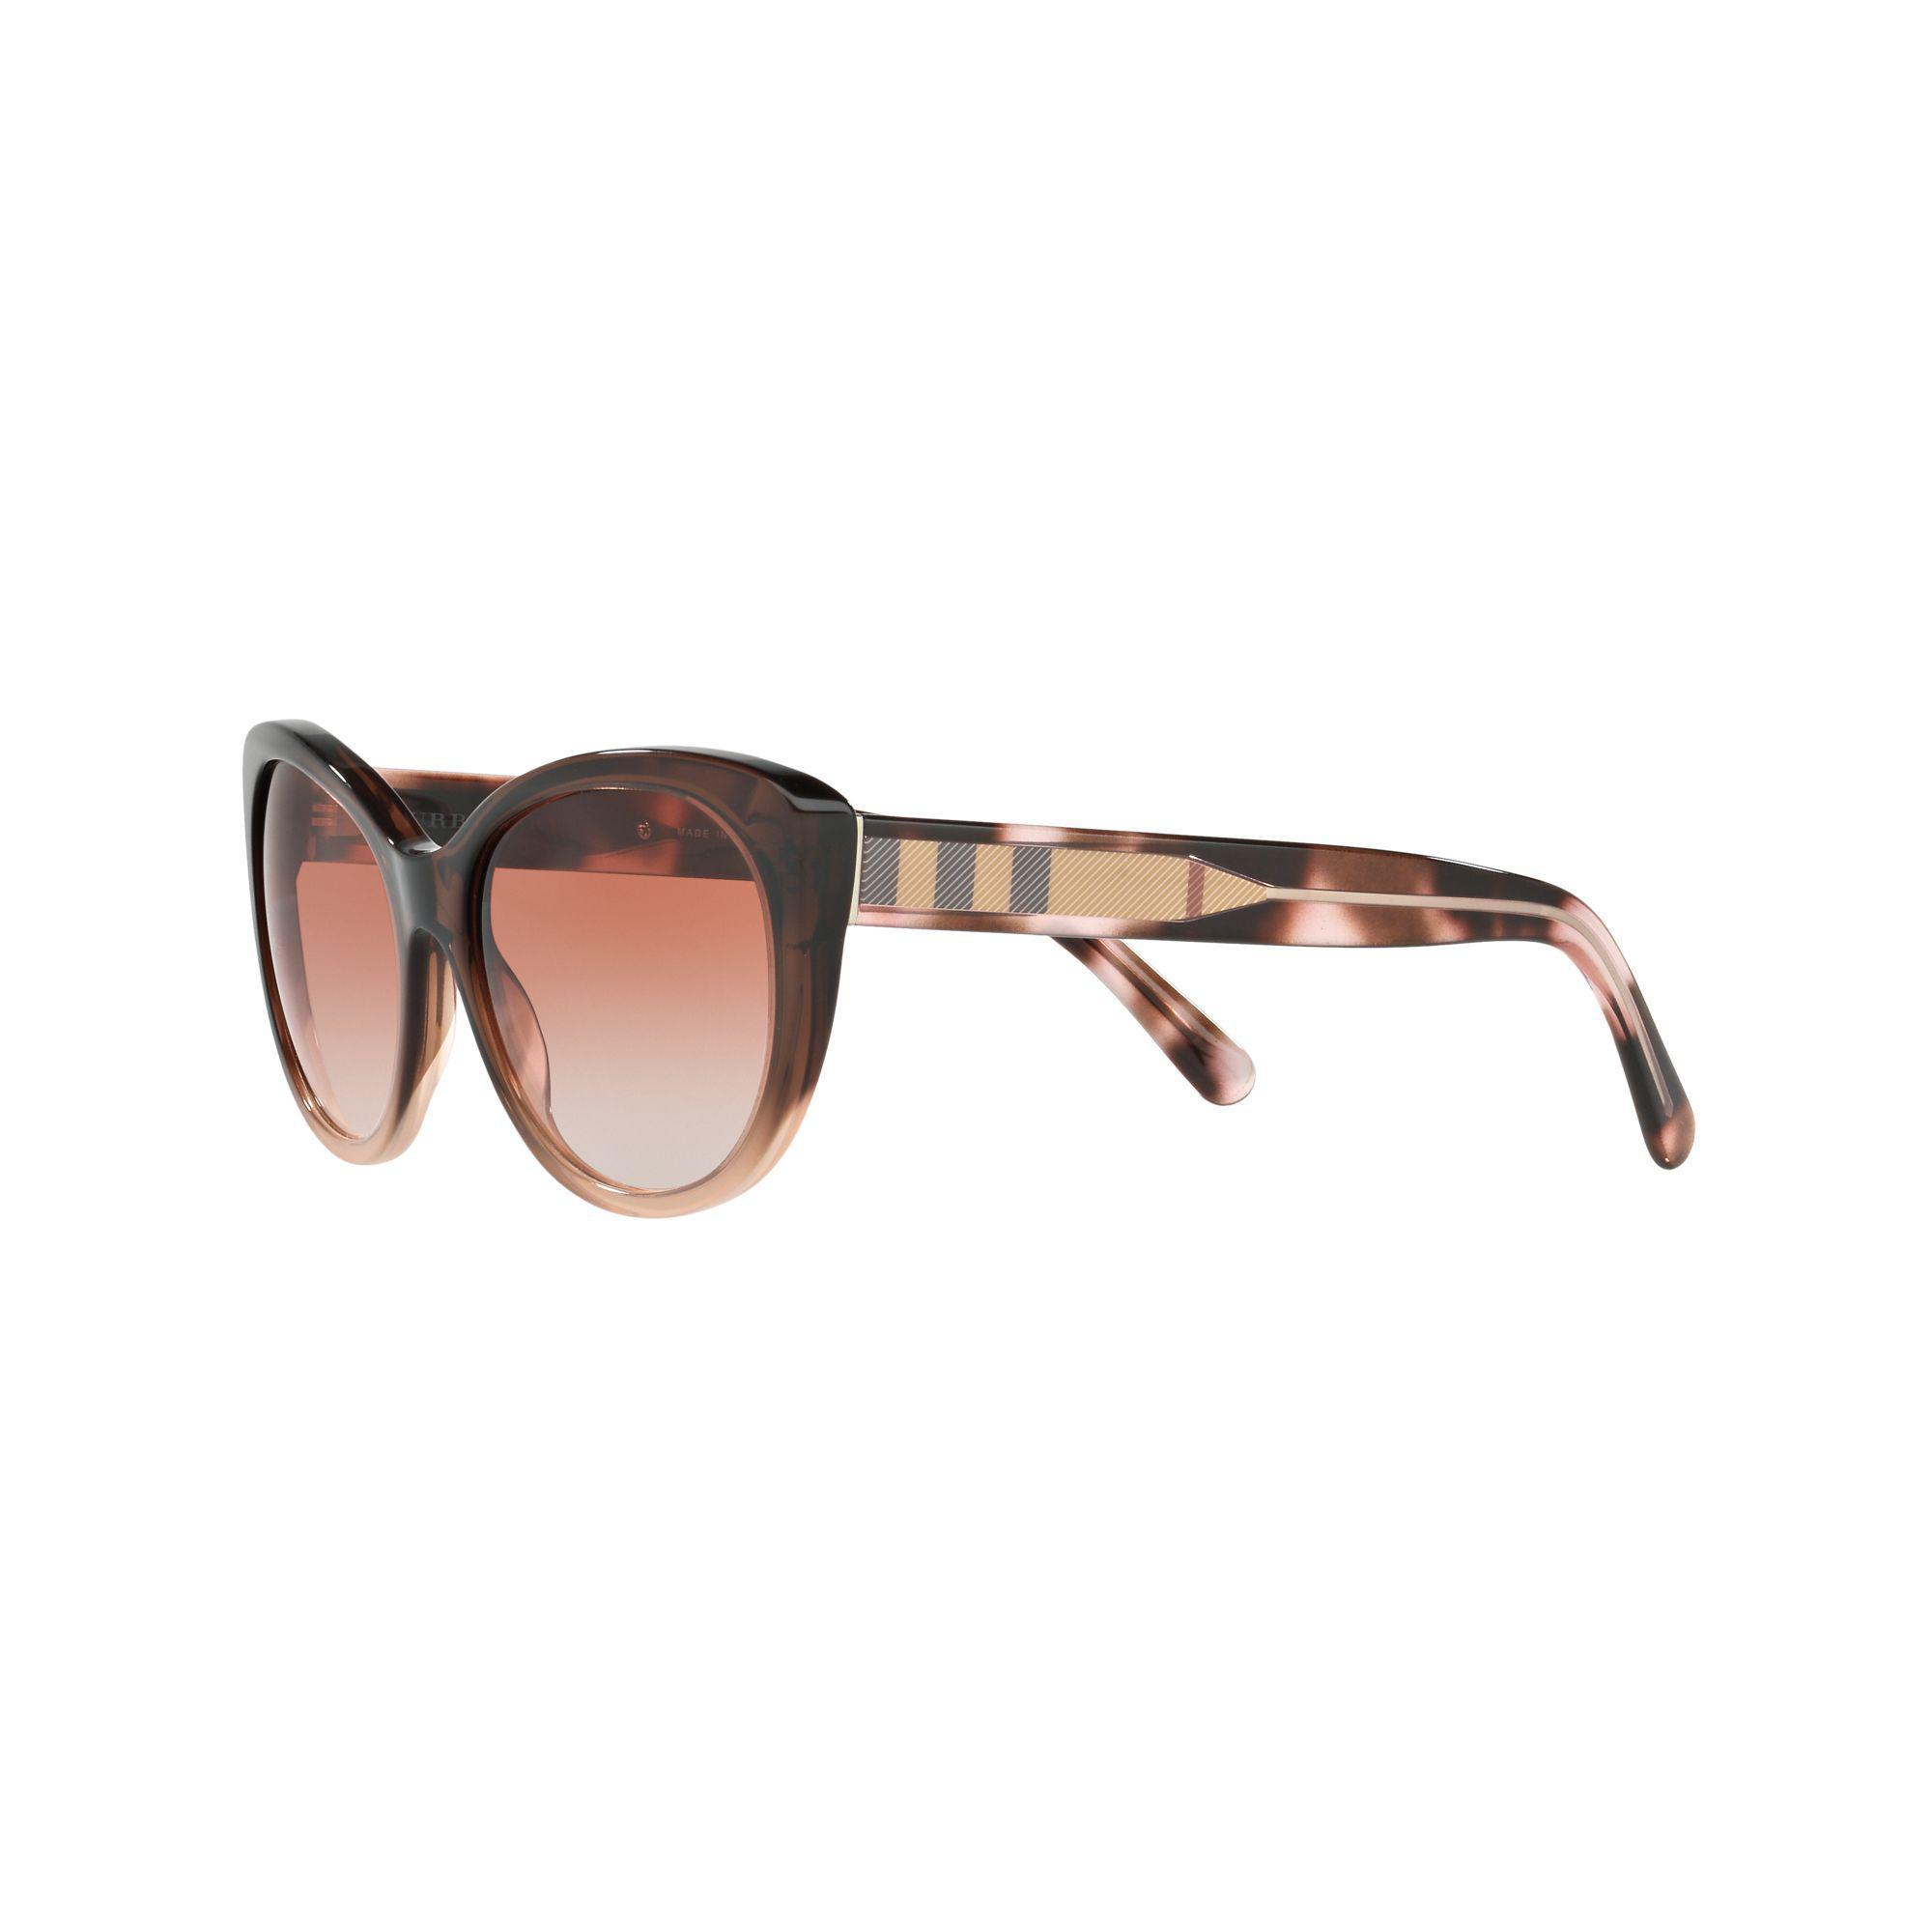 473d7014e1b9 Burberry - Natural Be4224 Cat s Eye Sunglasses - Lyst. View fullscreen